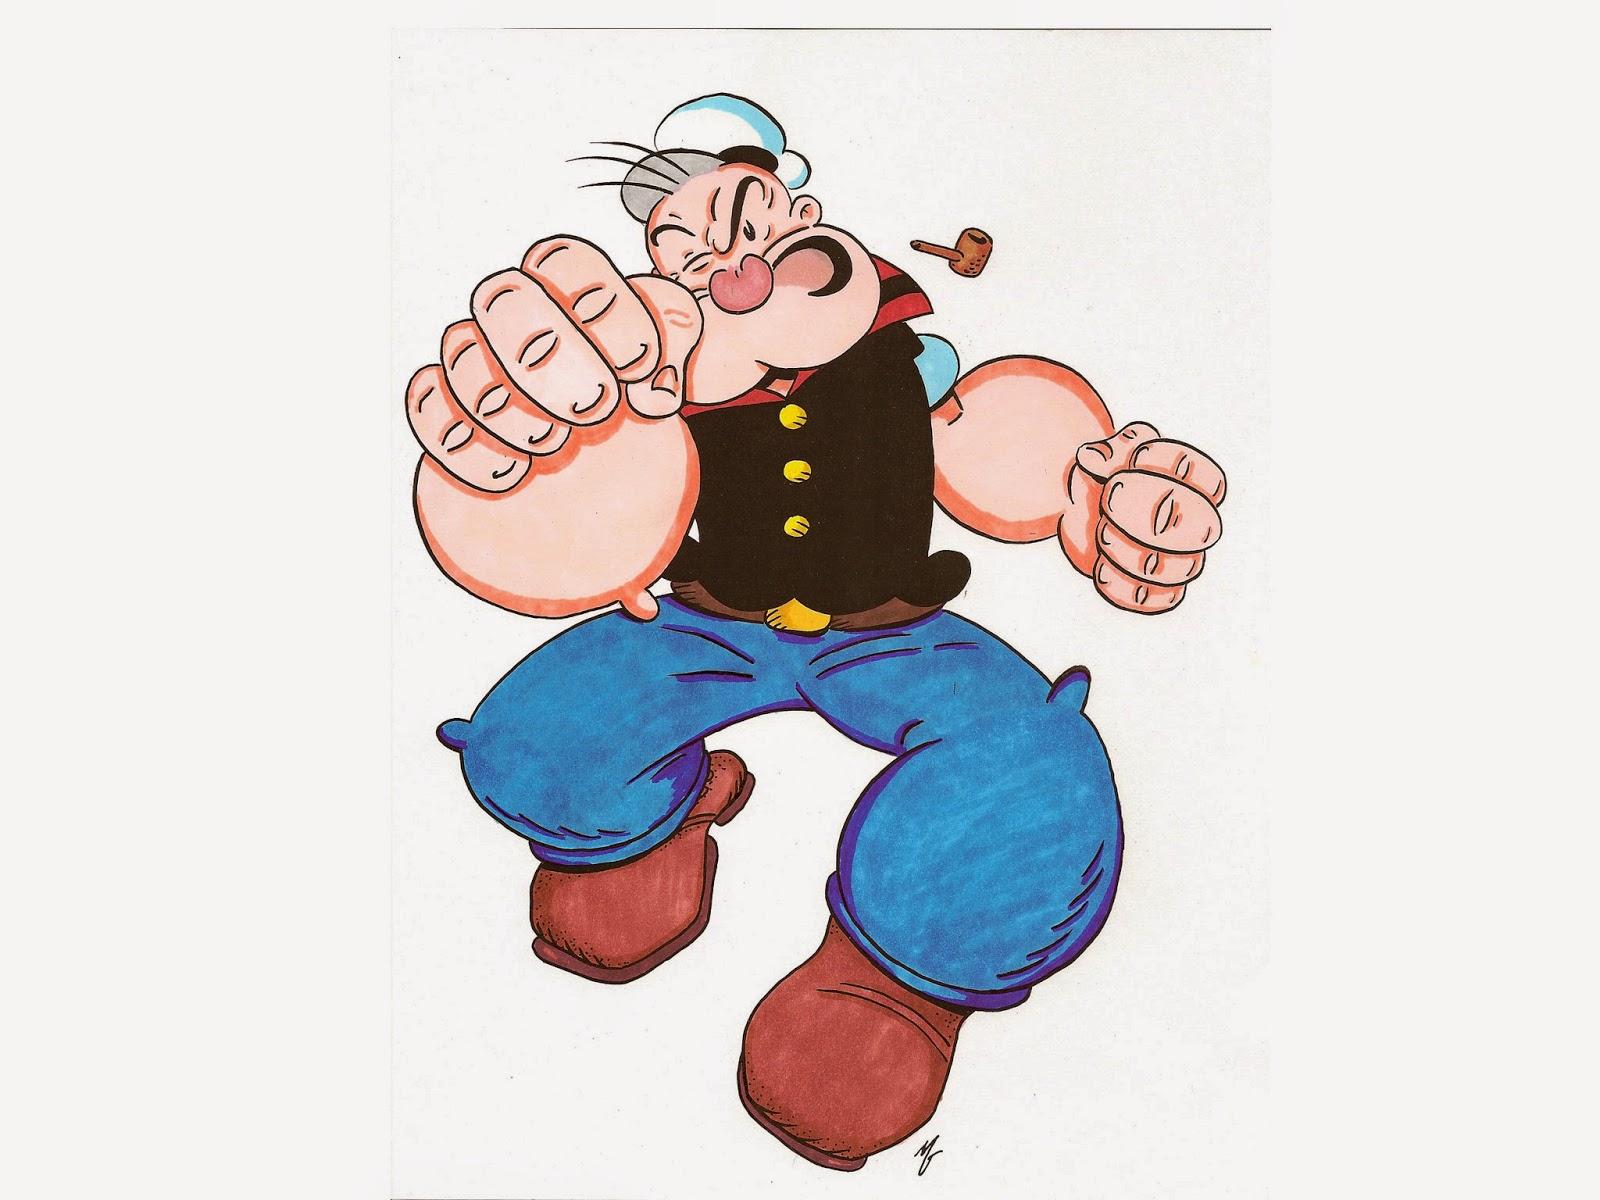 Wallpaper Popeye The Sailor Lucu dan Keren  Deloiz Wallpaper